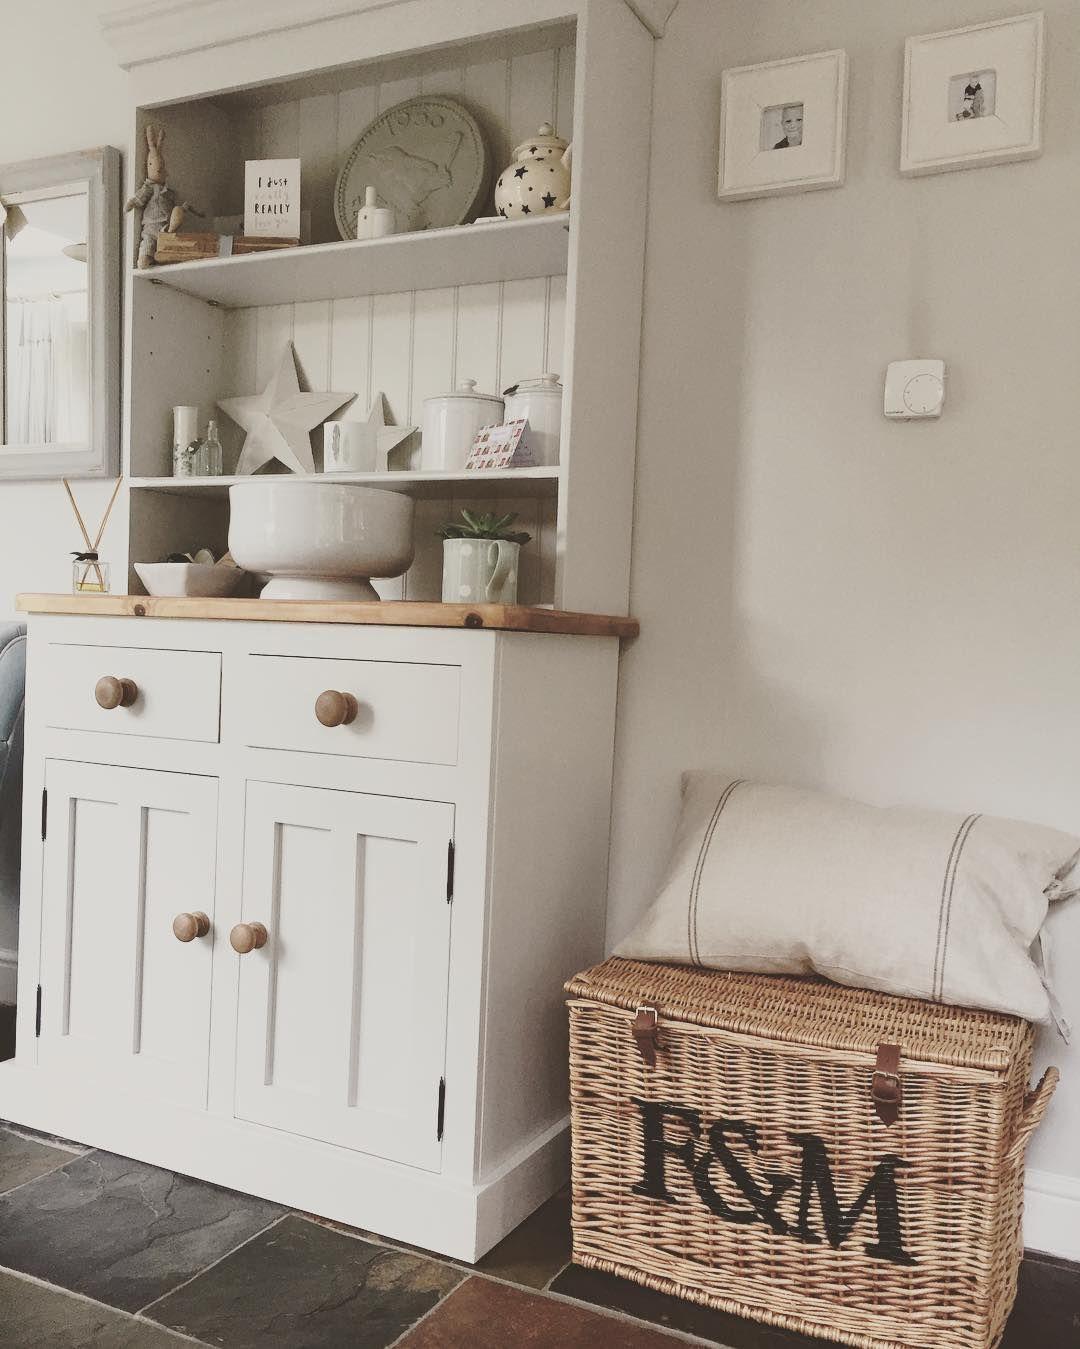 Pin de Flo Scott en Home | Pinterest | Rincón del hogar, Ideas de ...